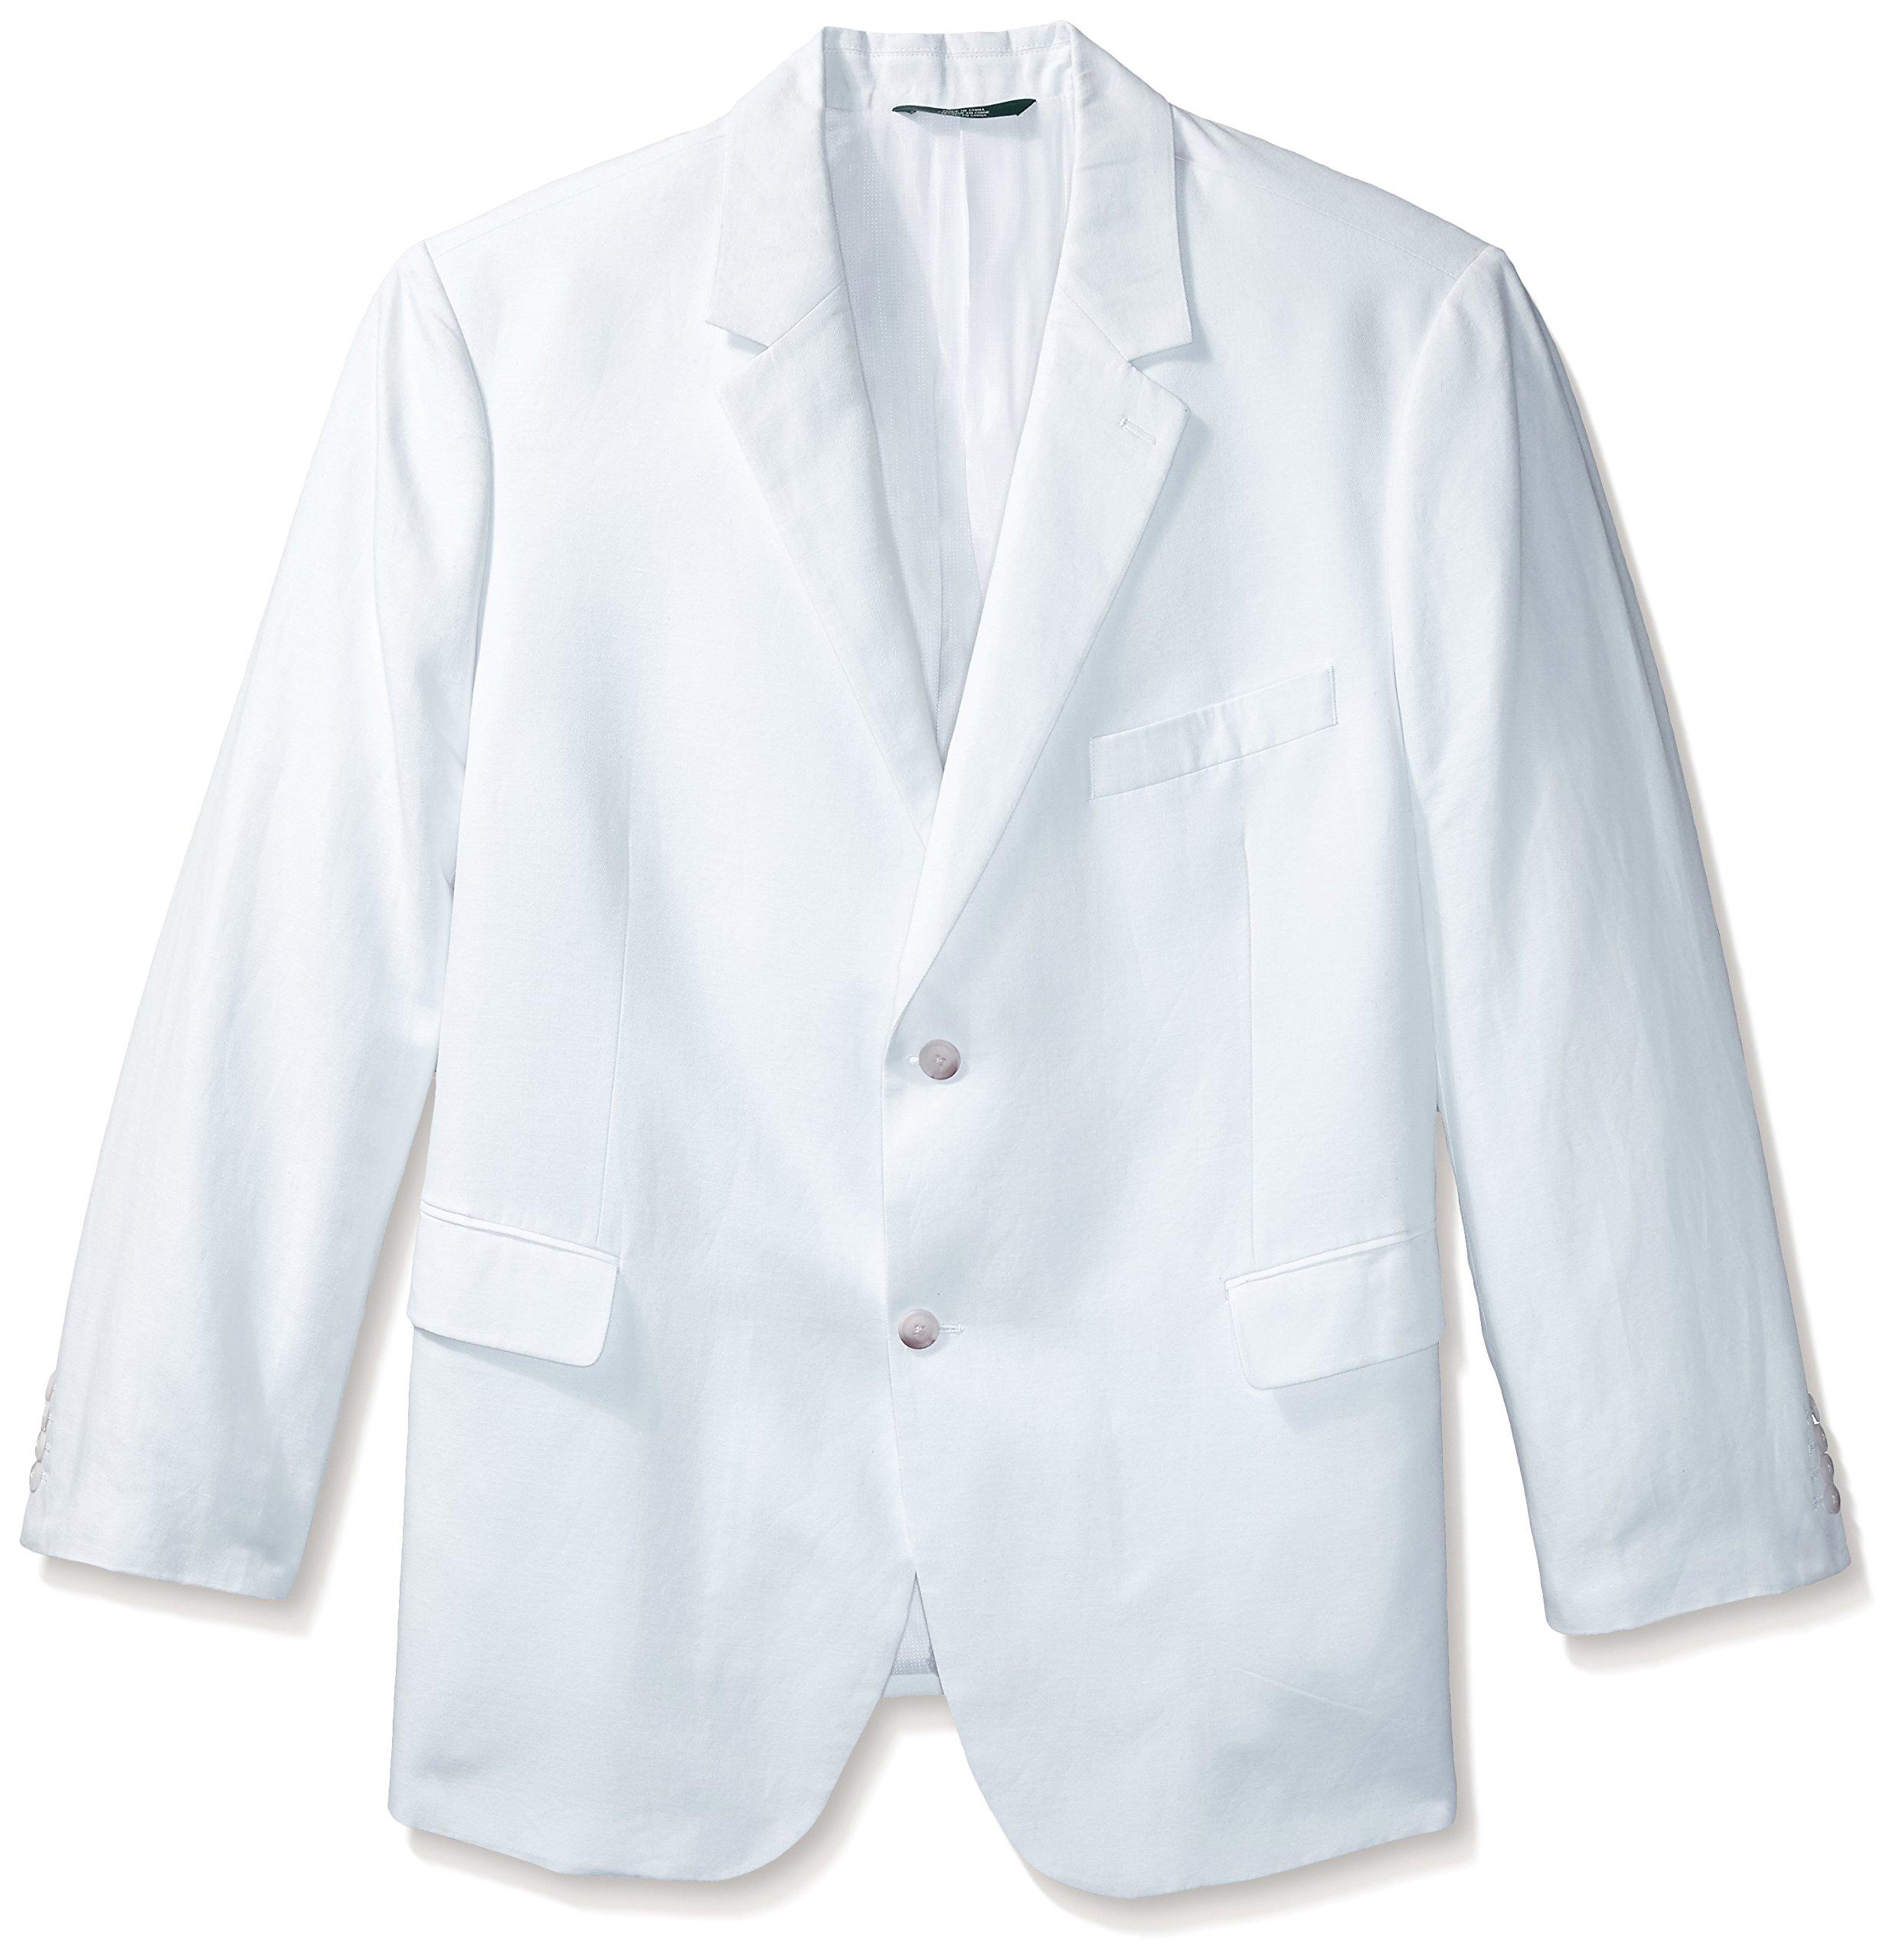 Perry Ellis Men's Big-Tall Linen Suit Jacket, Bright White, 50